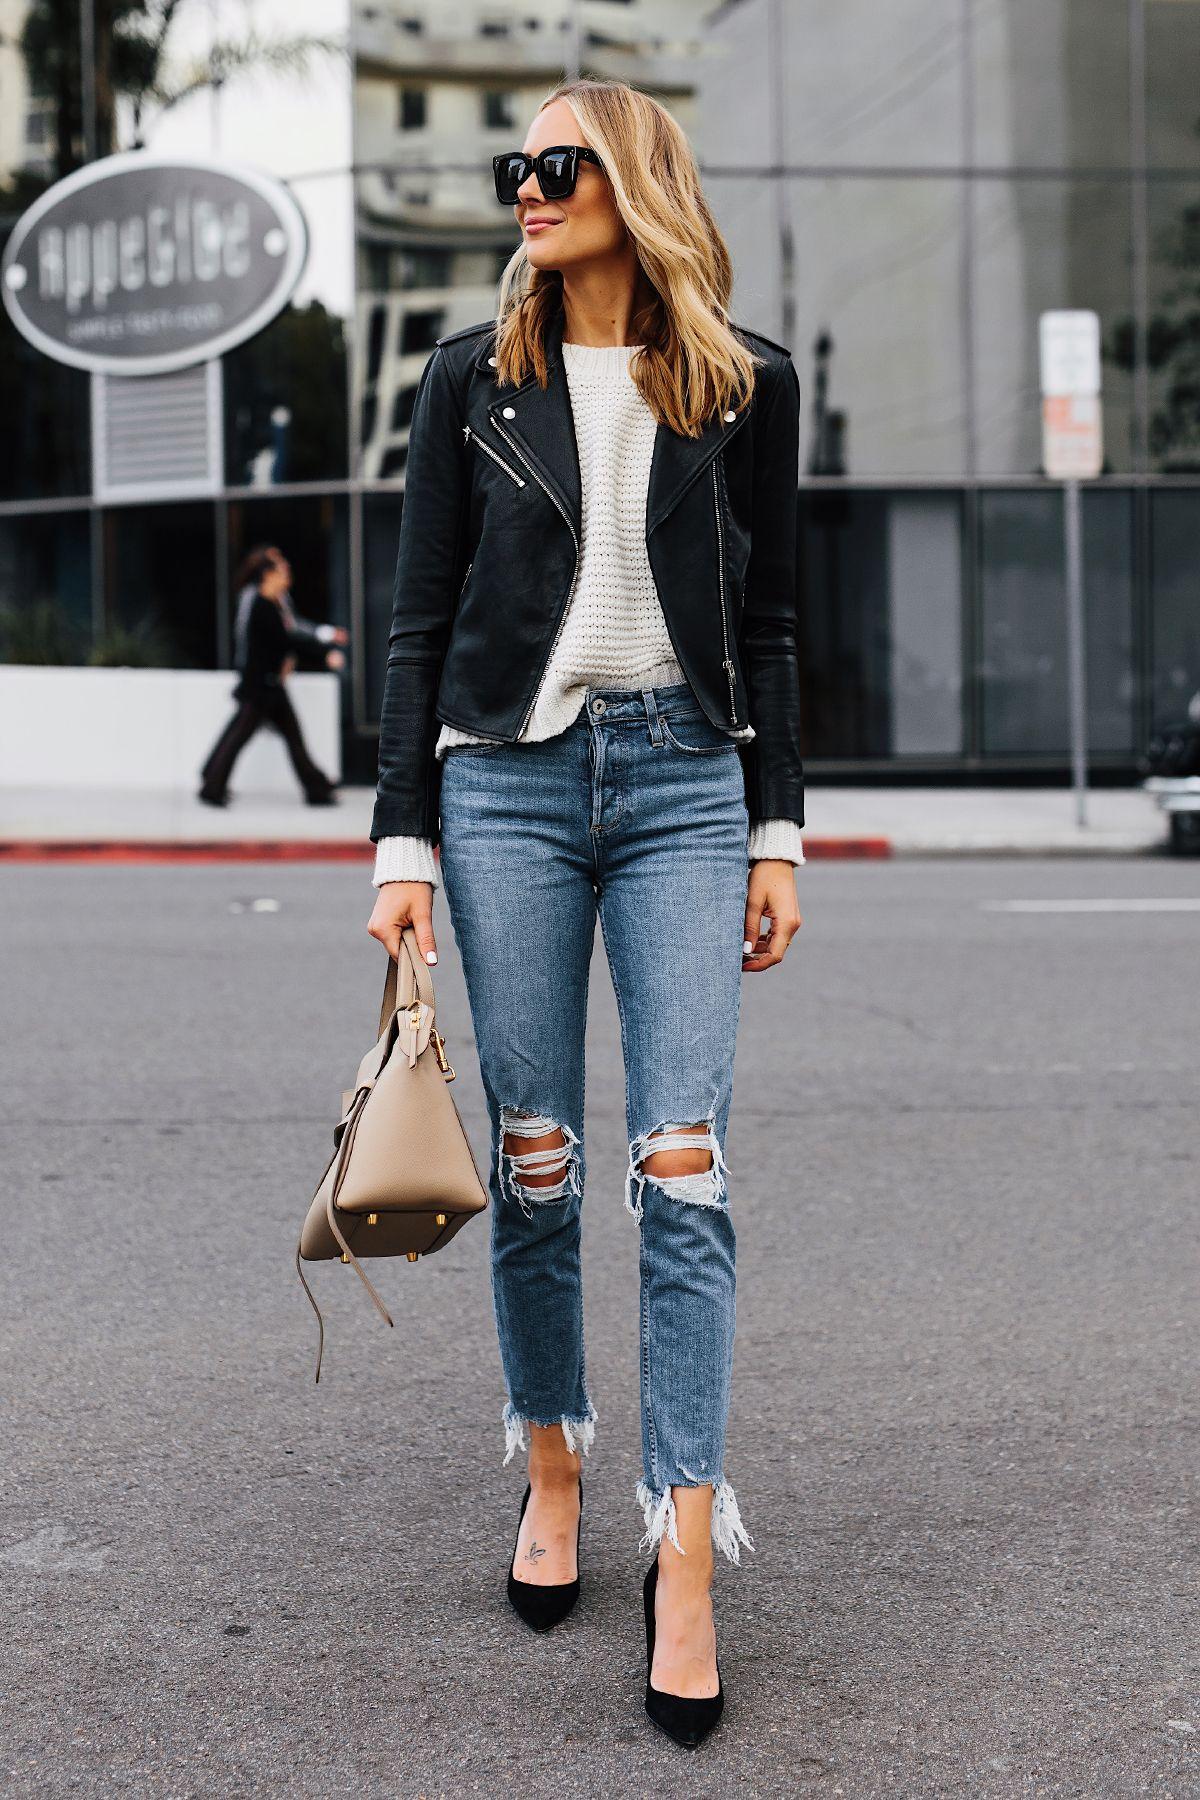 df7f8b7d49a1 Blonde Woman Wearing Club Monaco Black Leather Jacket Ivory Chunky Sweater  Paige Ripped Jeans Black Pumps Celine Mini Belt Bag Fashion Jackson San  Diego ...